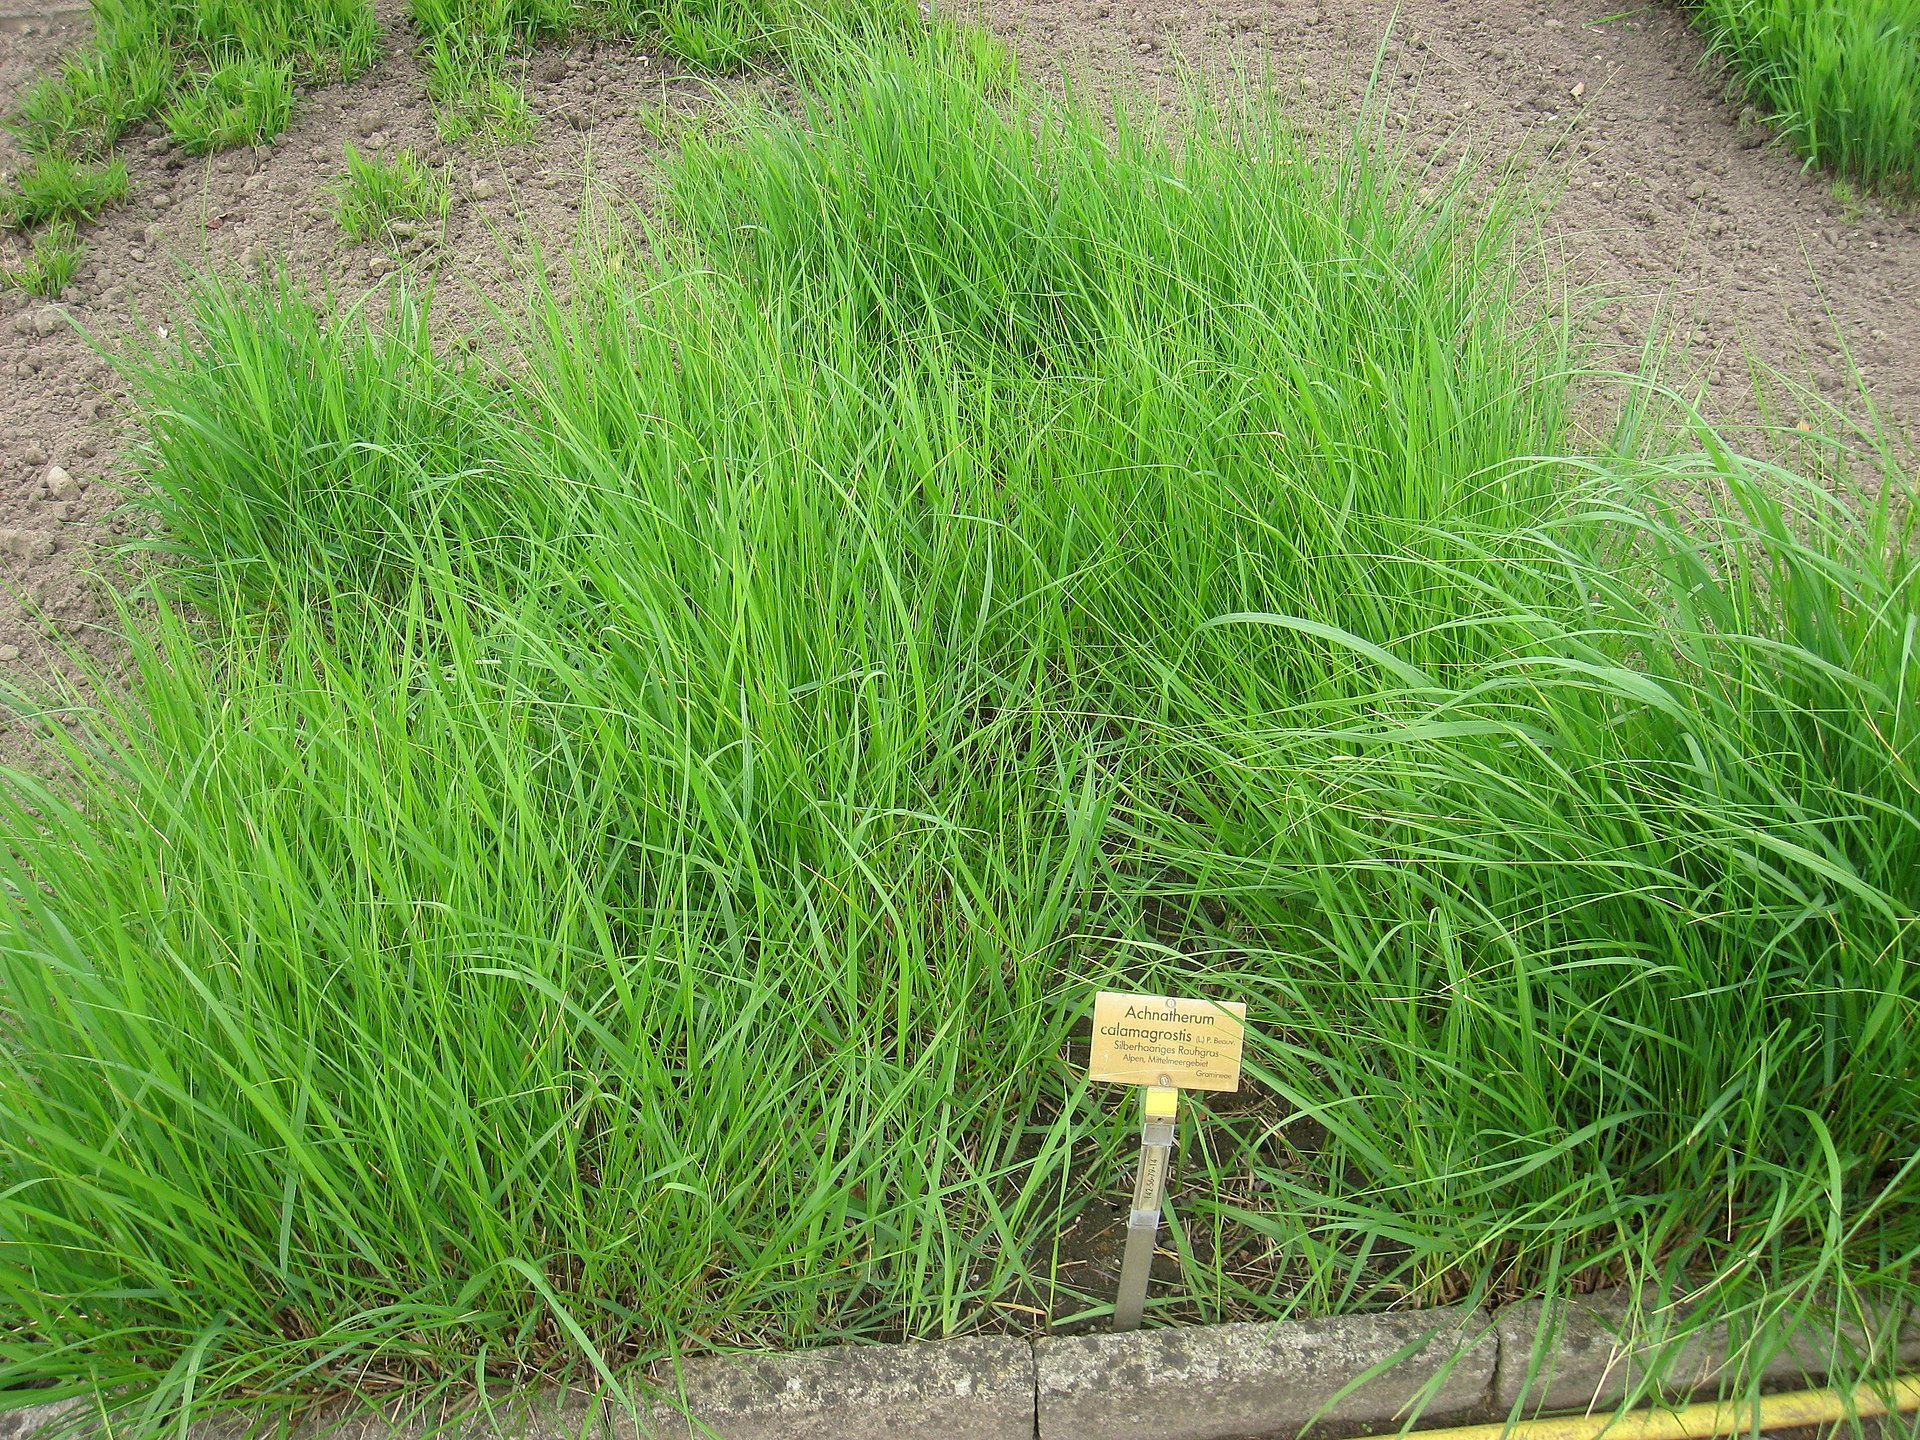 Achnatherum calamagrostis - Wikipedia